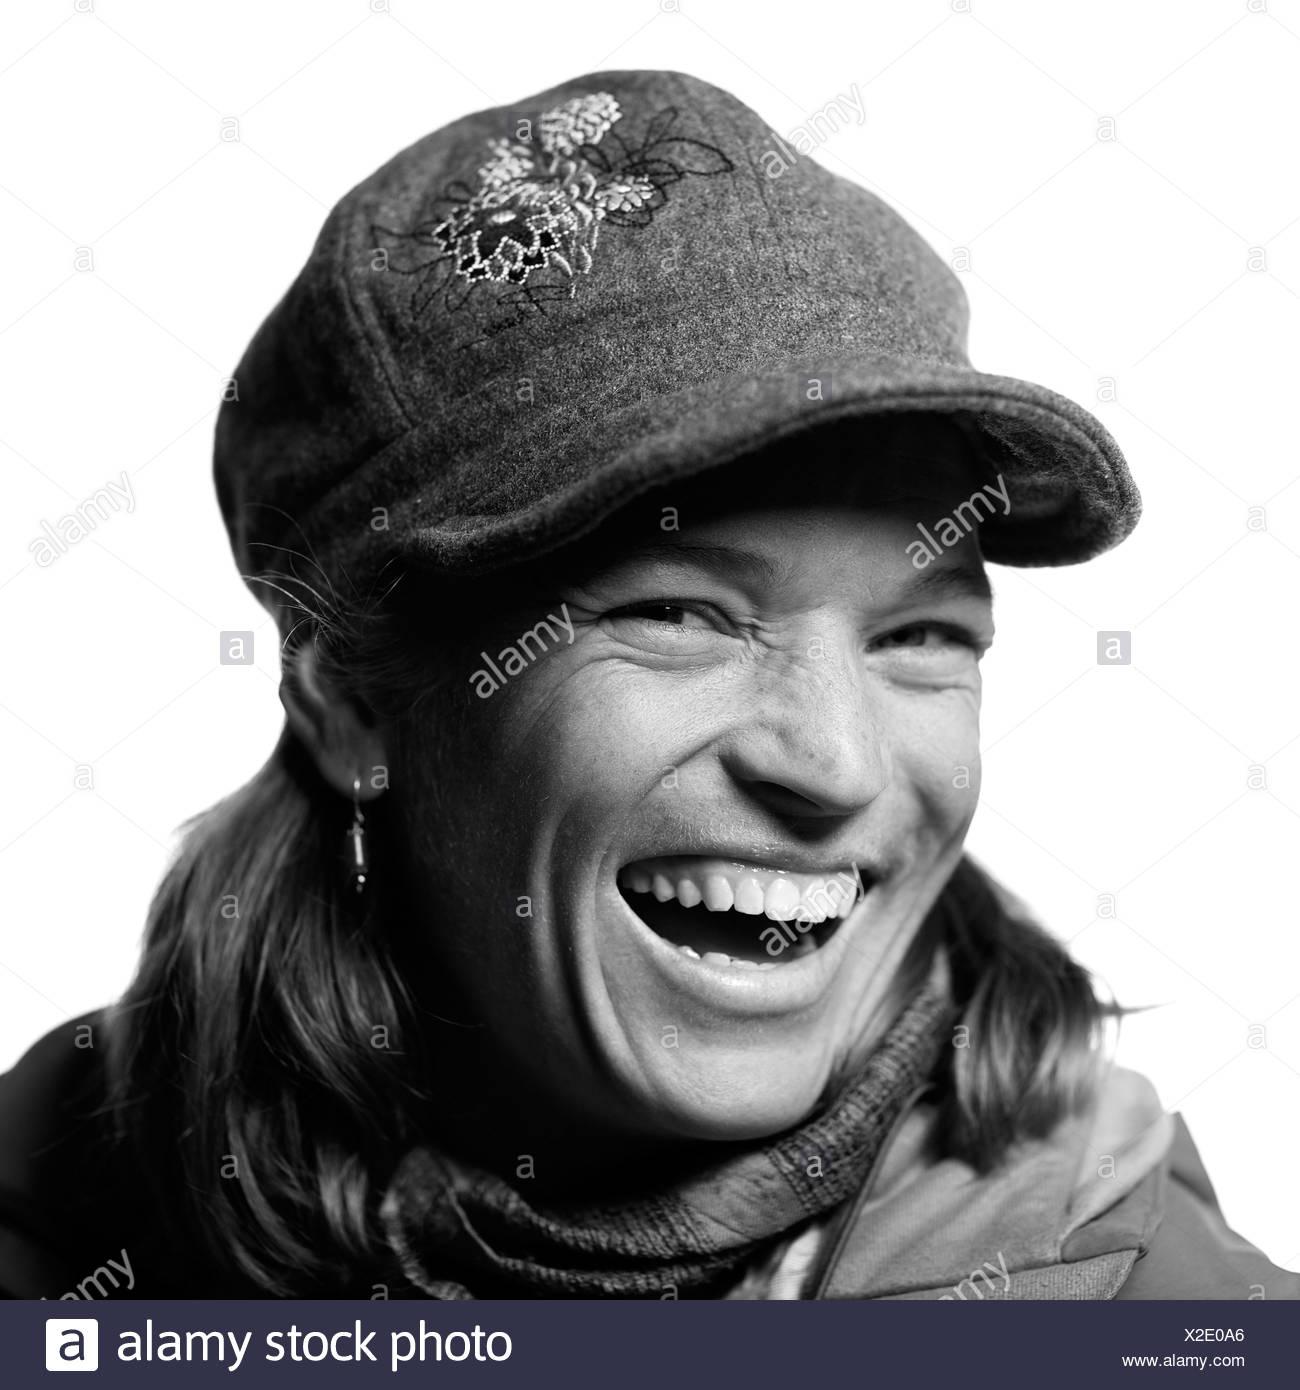 Jackson Hole Alpine Guide Portraits - Stock Image